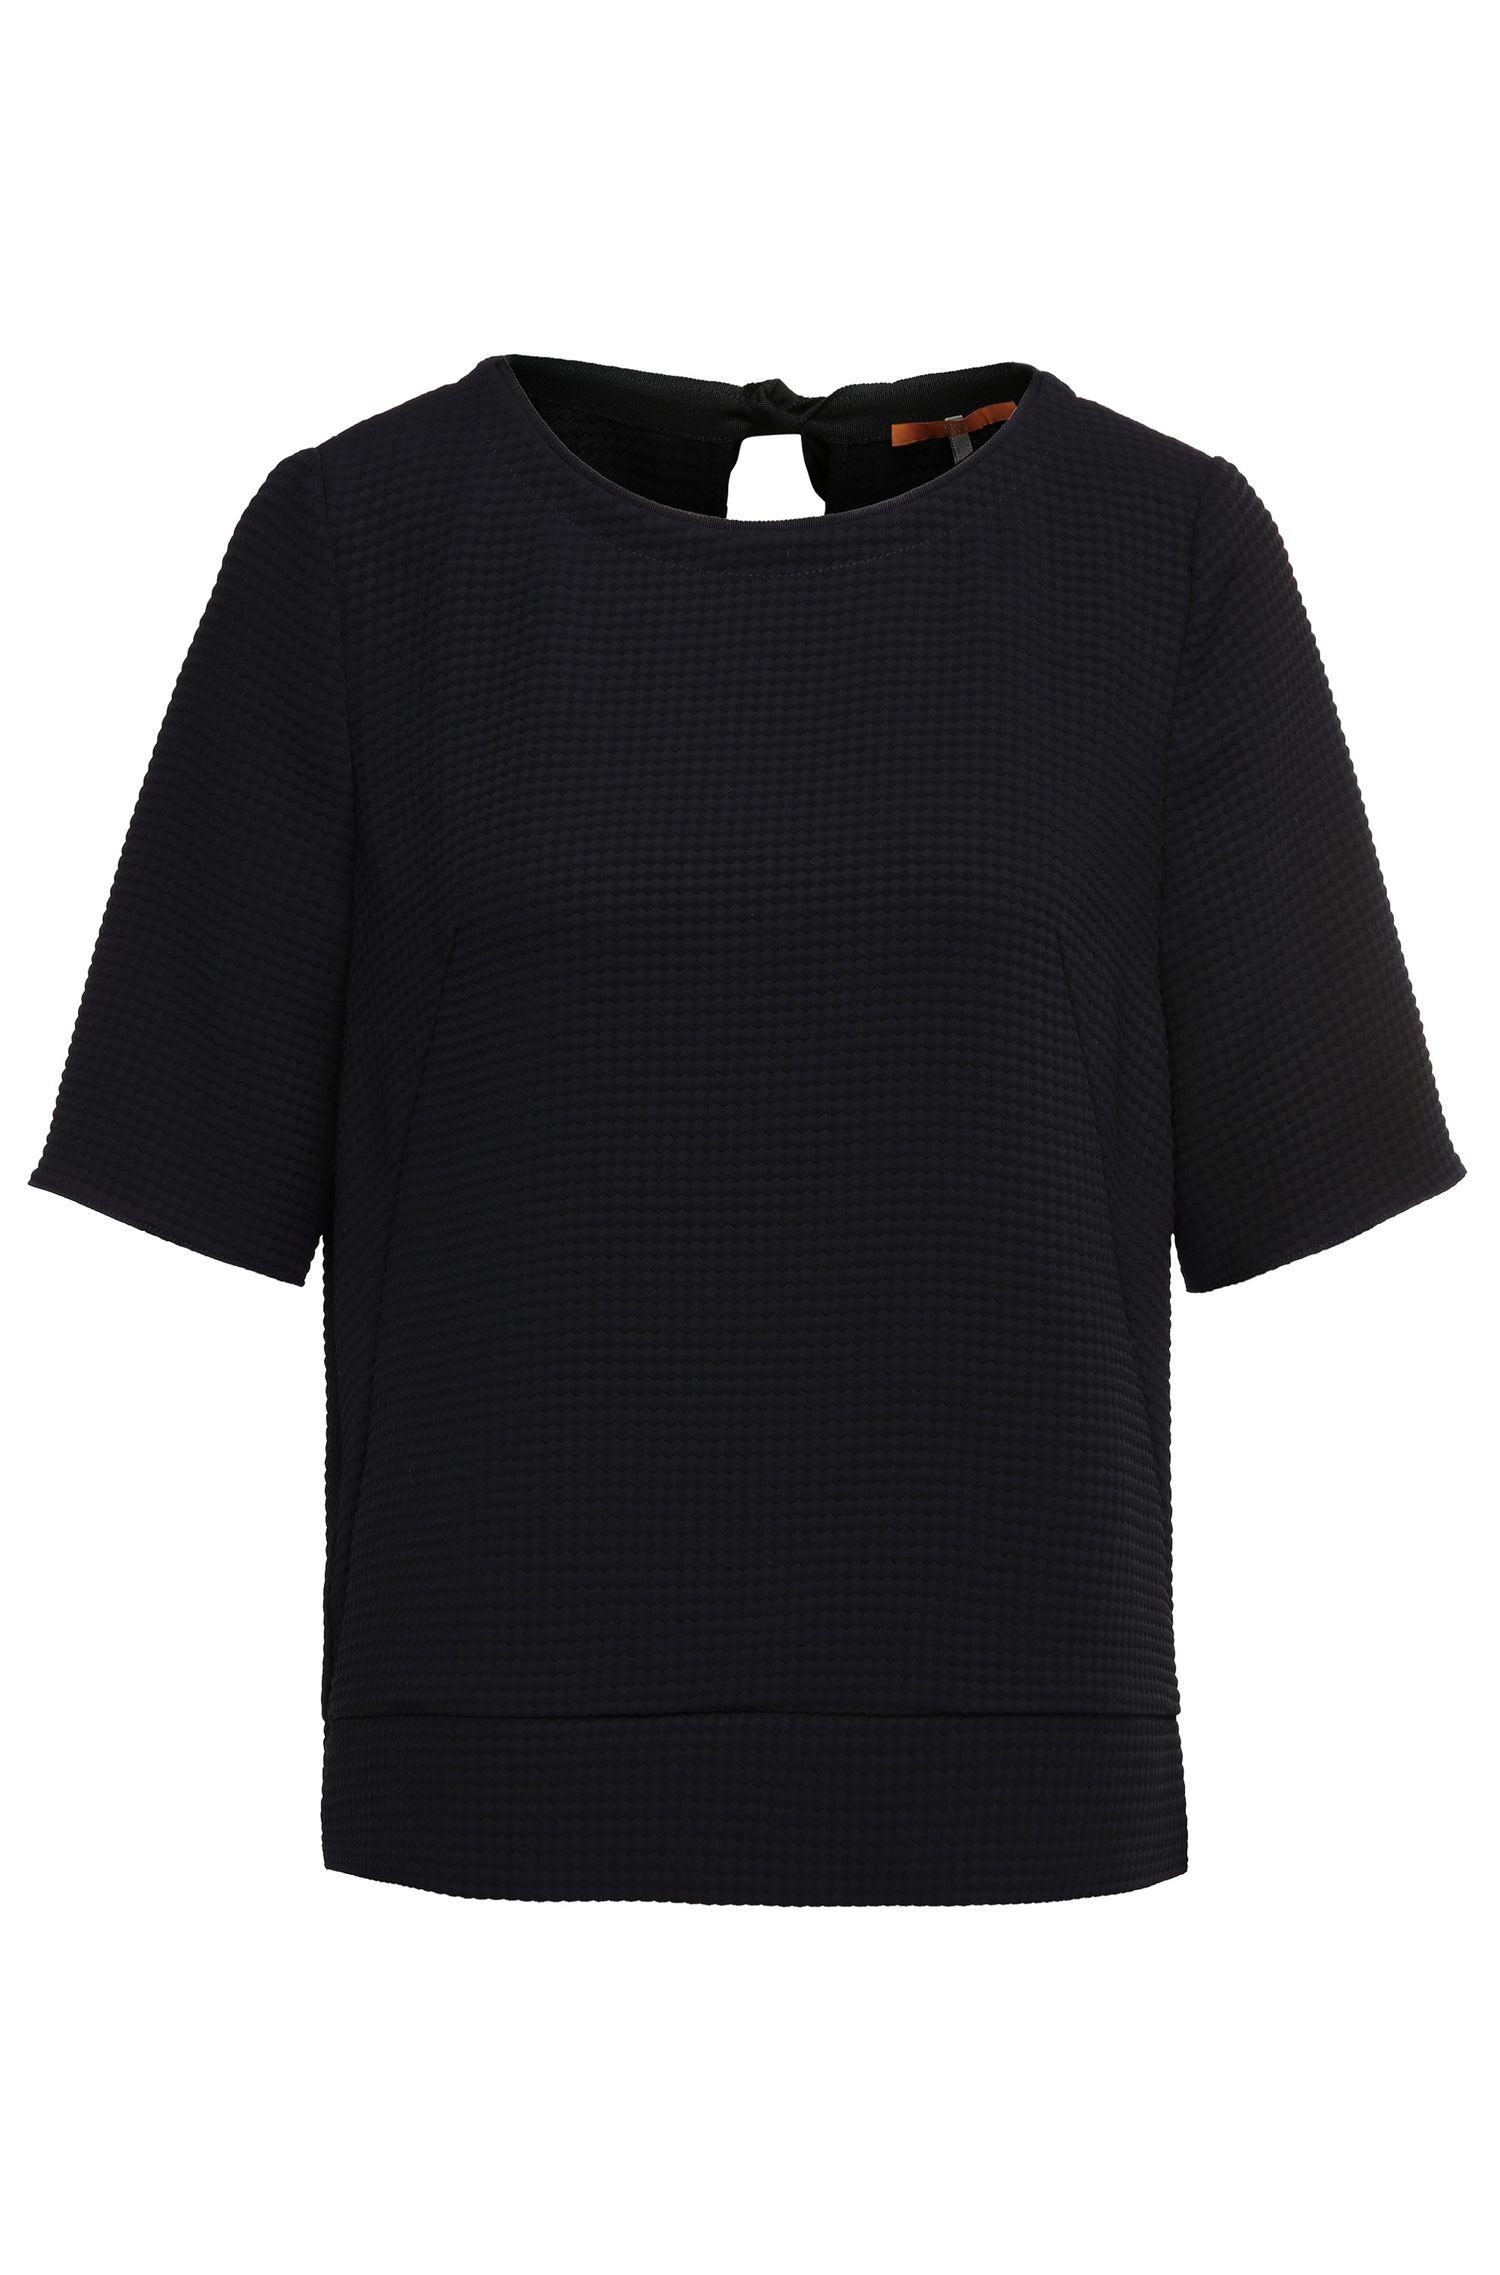 Regular-fit top in textured fabric blend: 'Kadotty'